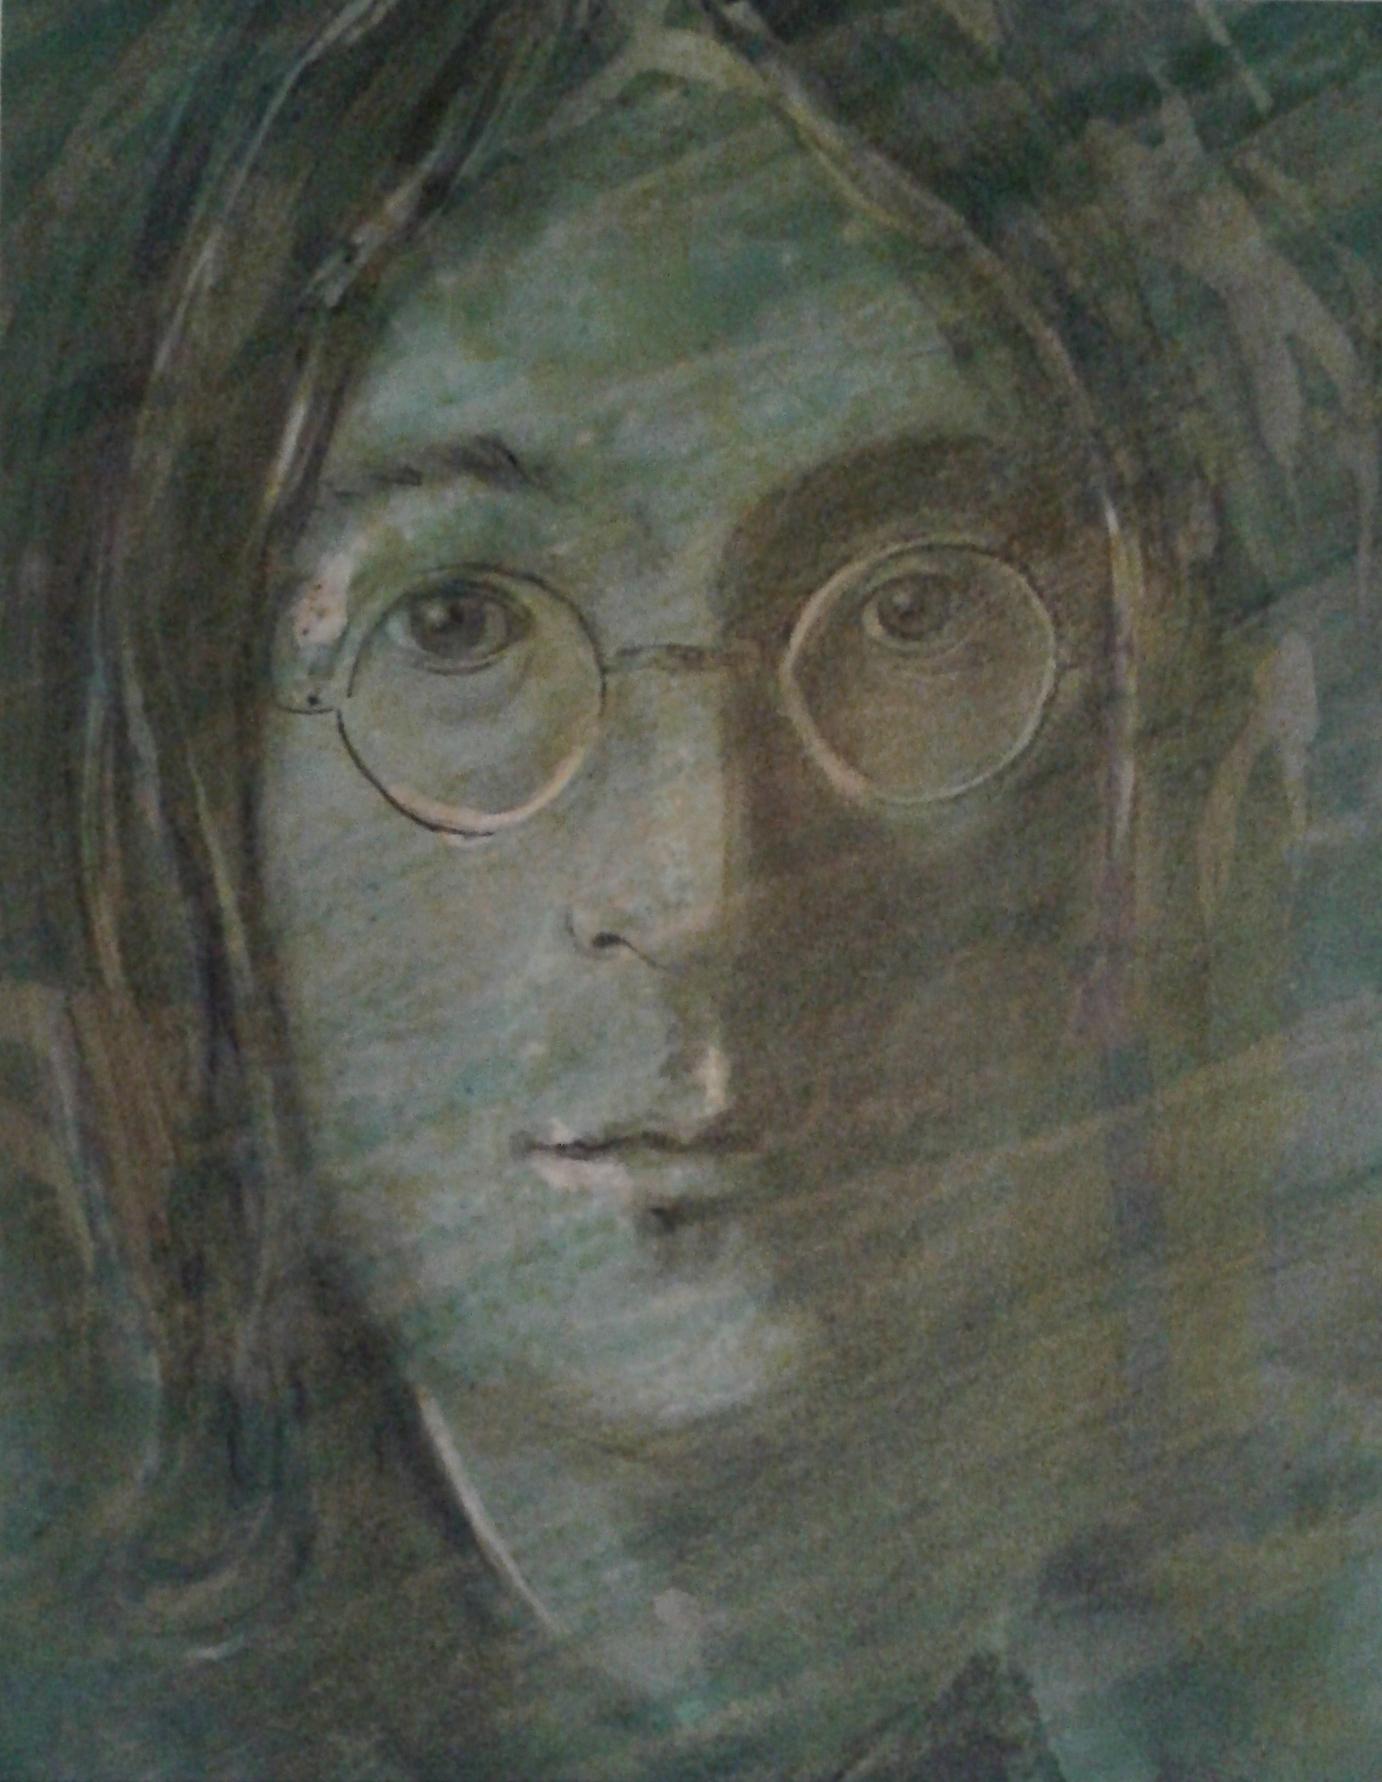 ART HFrei - J. Lennon - Aquarell-Pastell-Mischtechnik